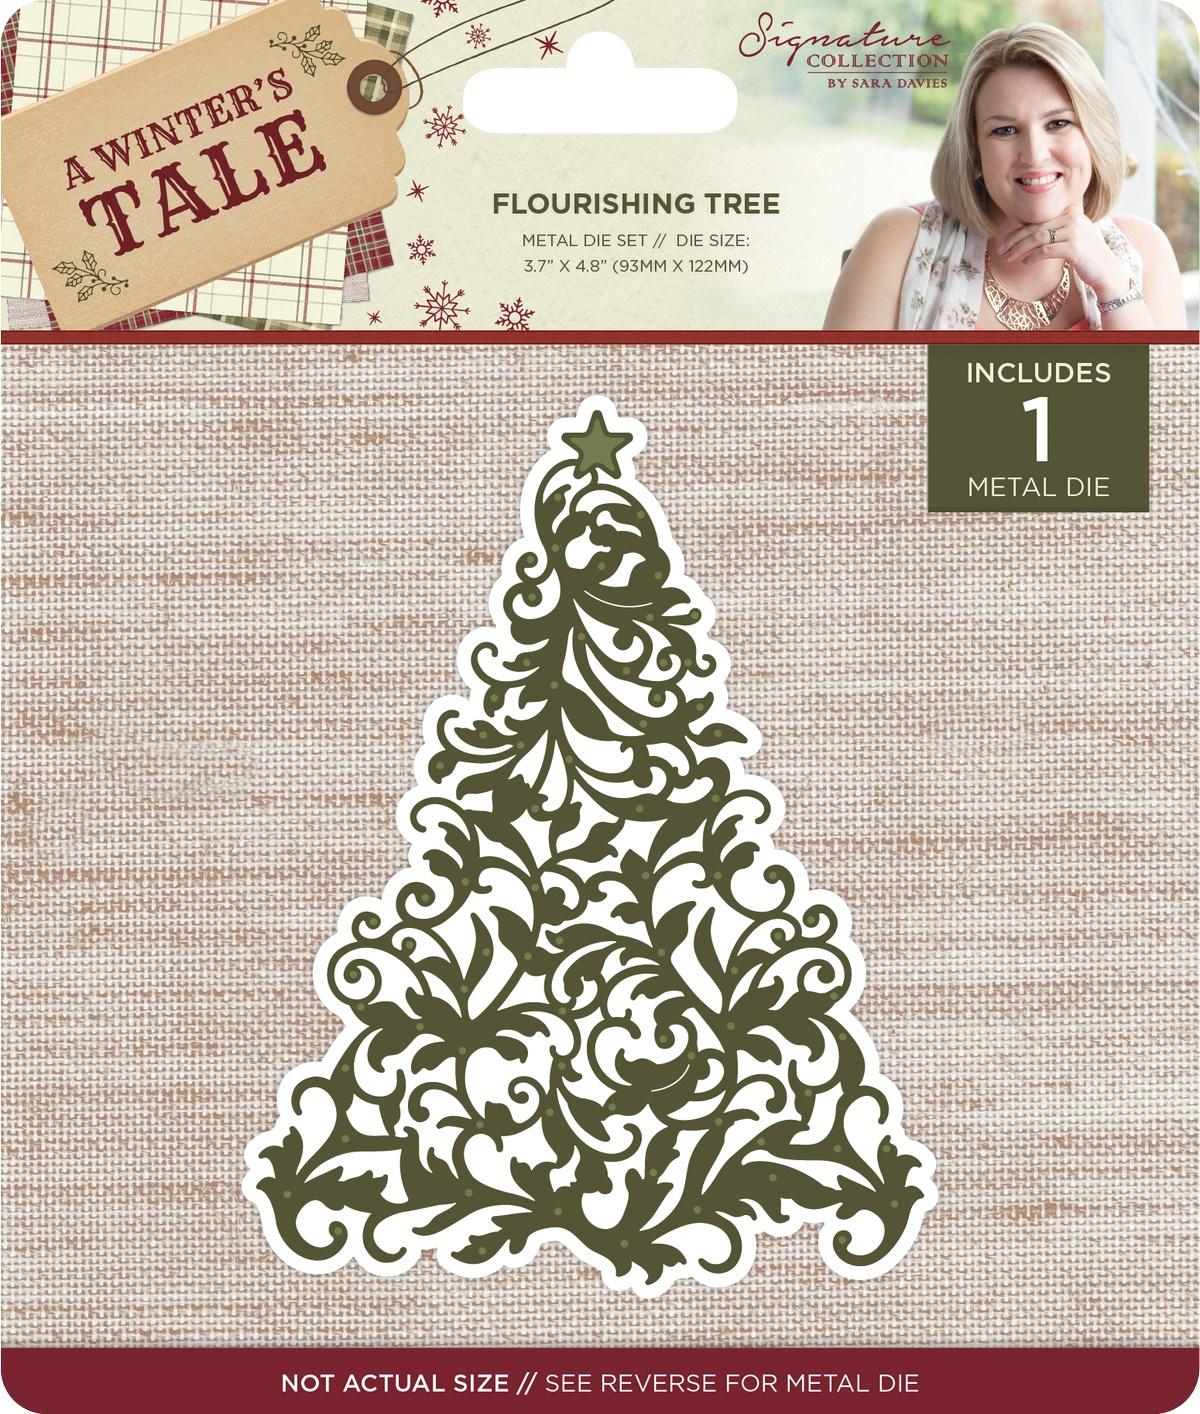 Sara Davies Signature A Winter's Tale Metal Die-Flourishing Tree